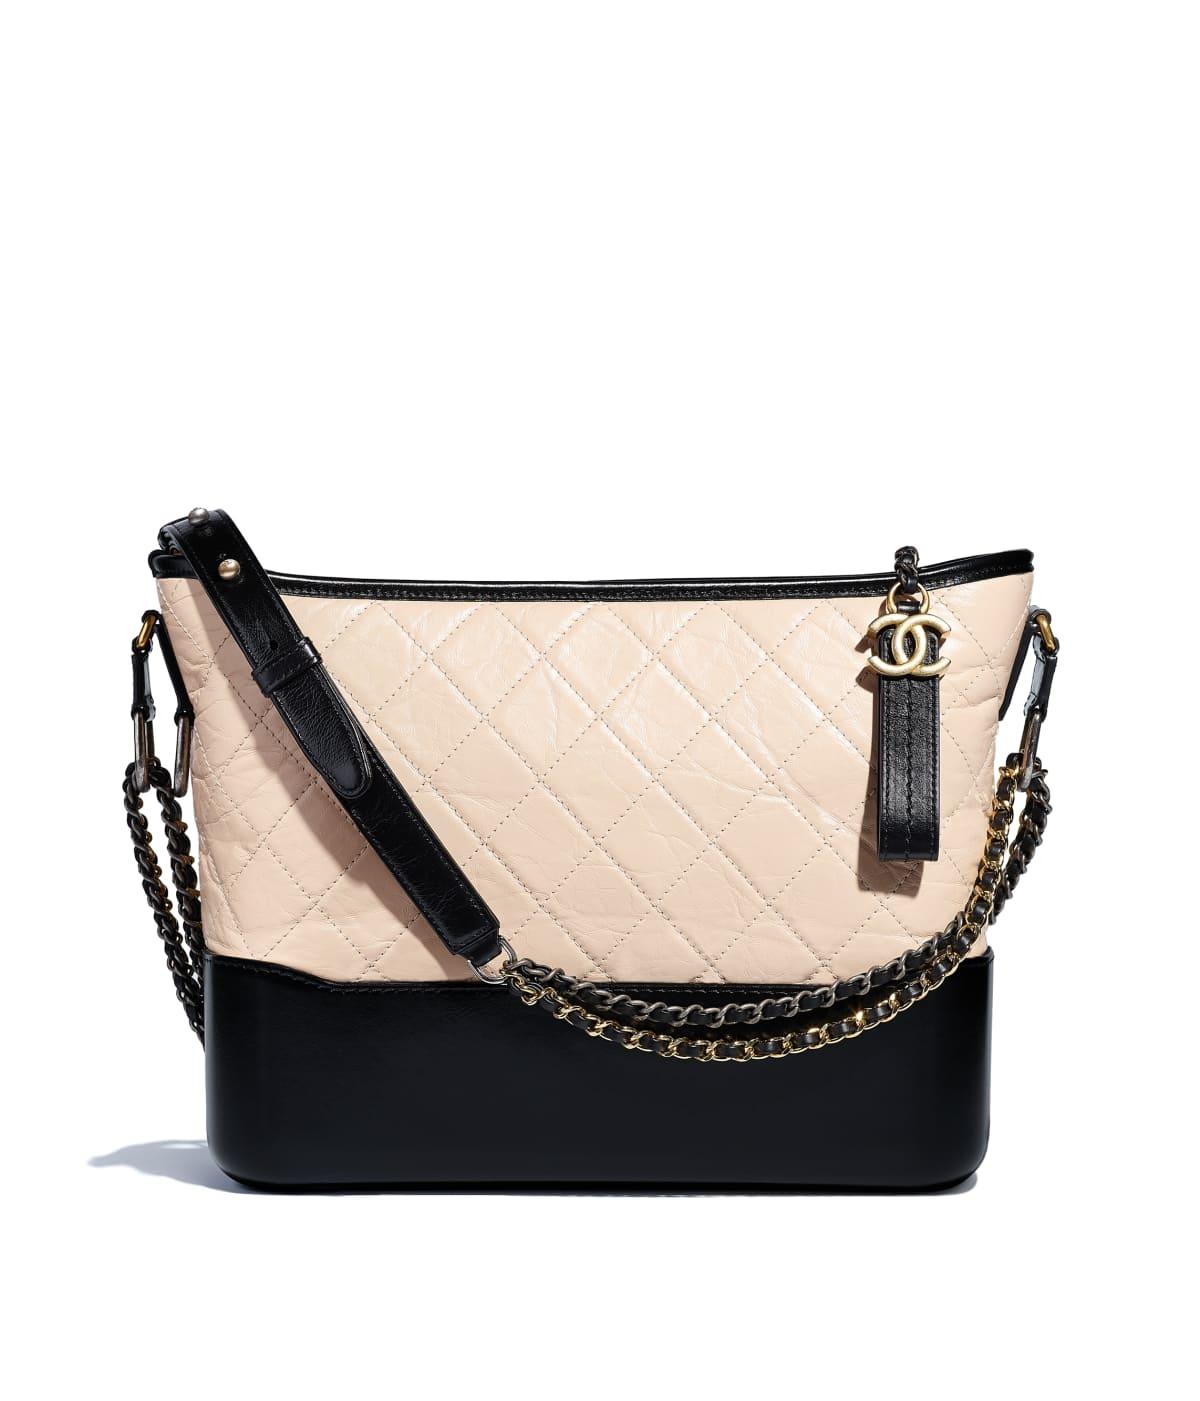 e3500e307240 CHANEL'S GABRIELLE Hobo Bag, aged calfskin, smooth calfskin, silver-tone &  gold-tone metal, beige & black ...